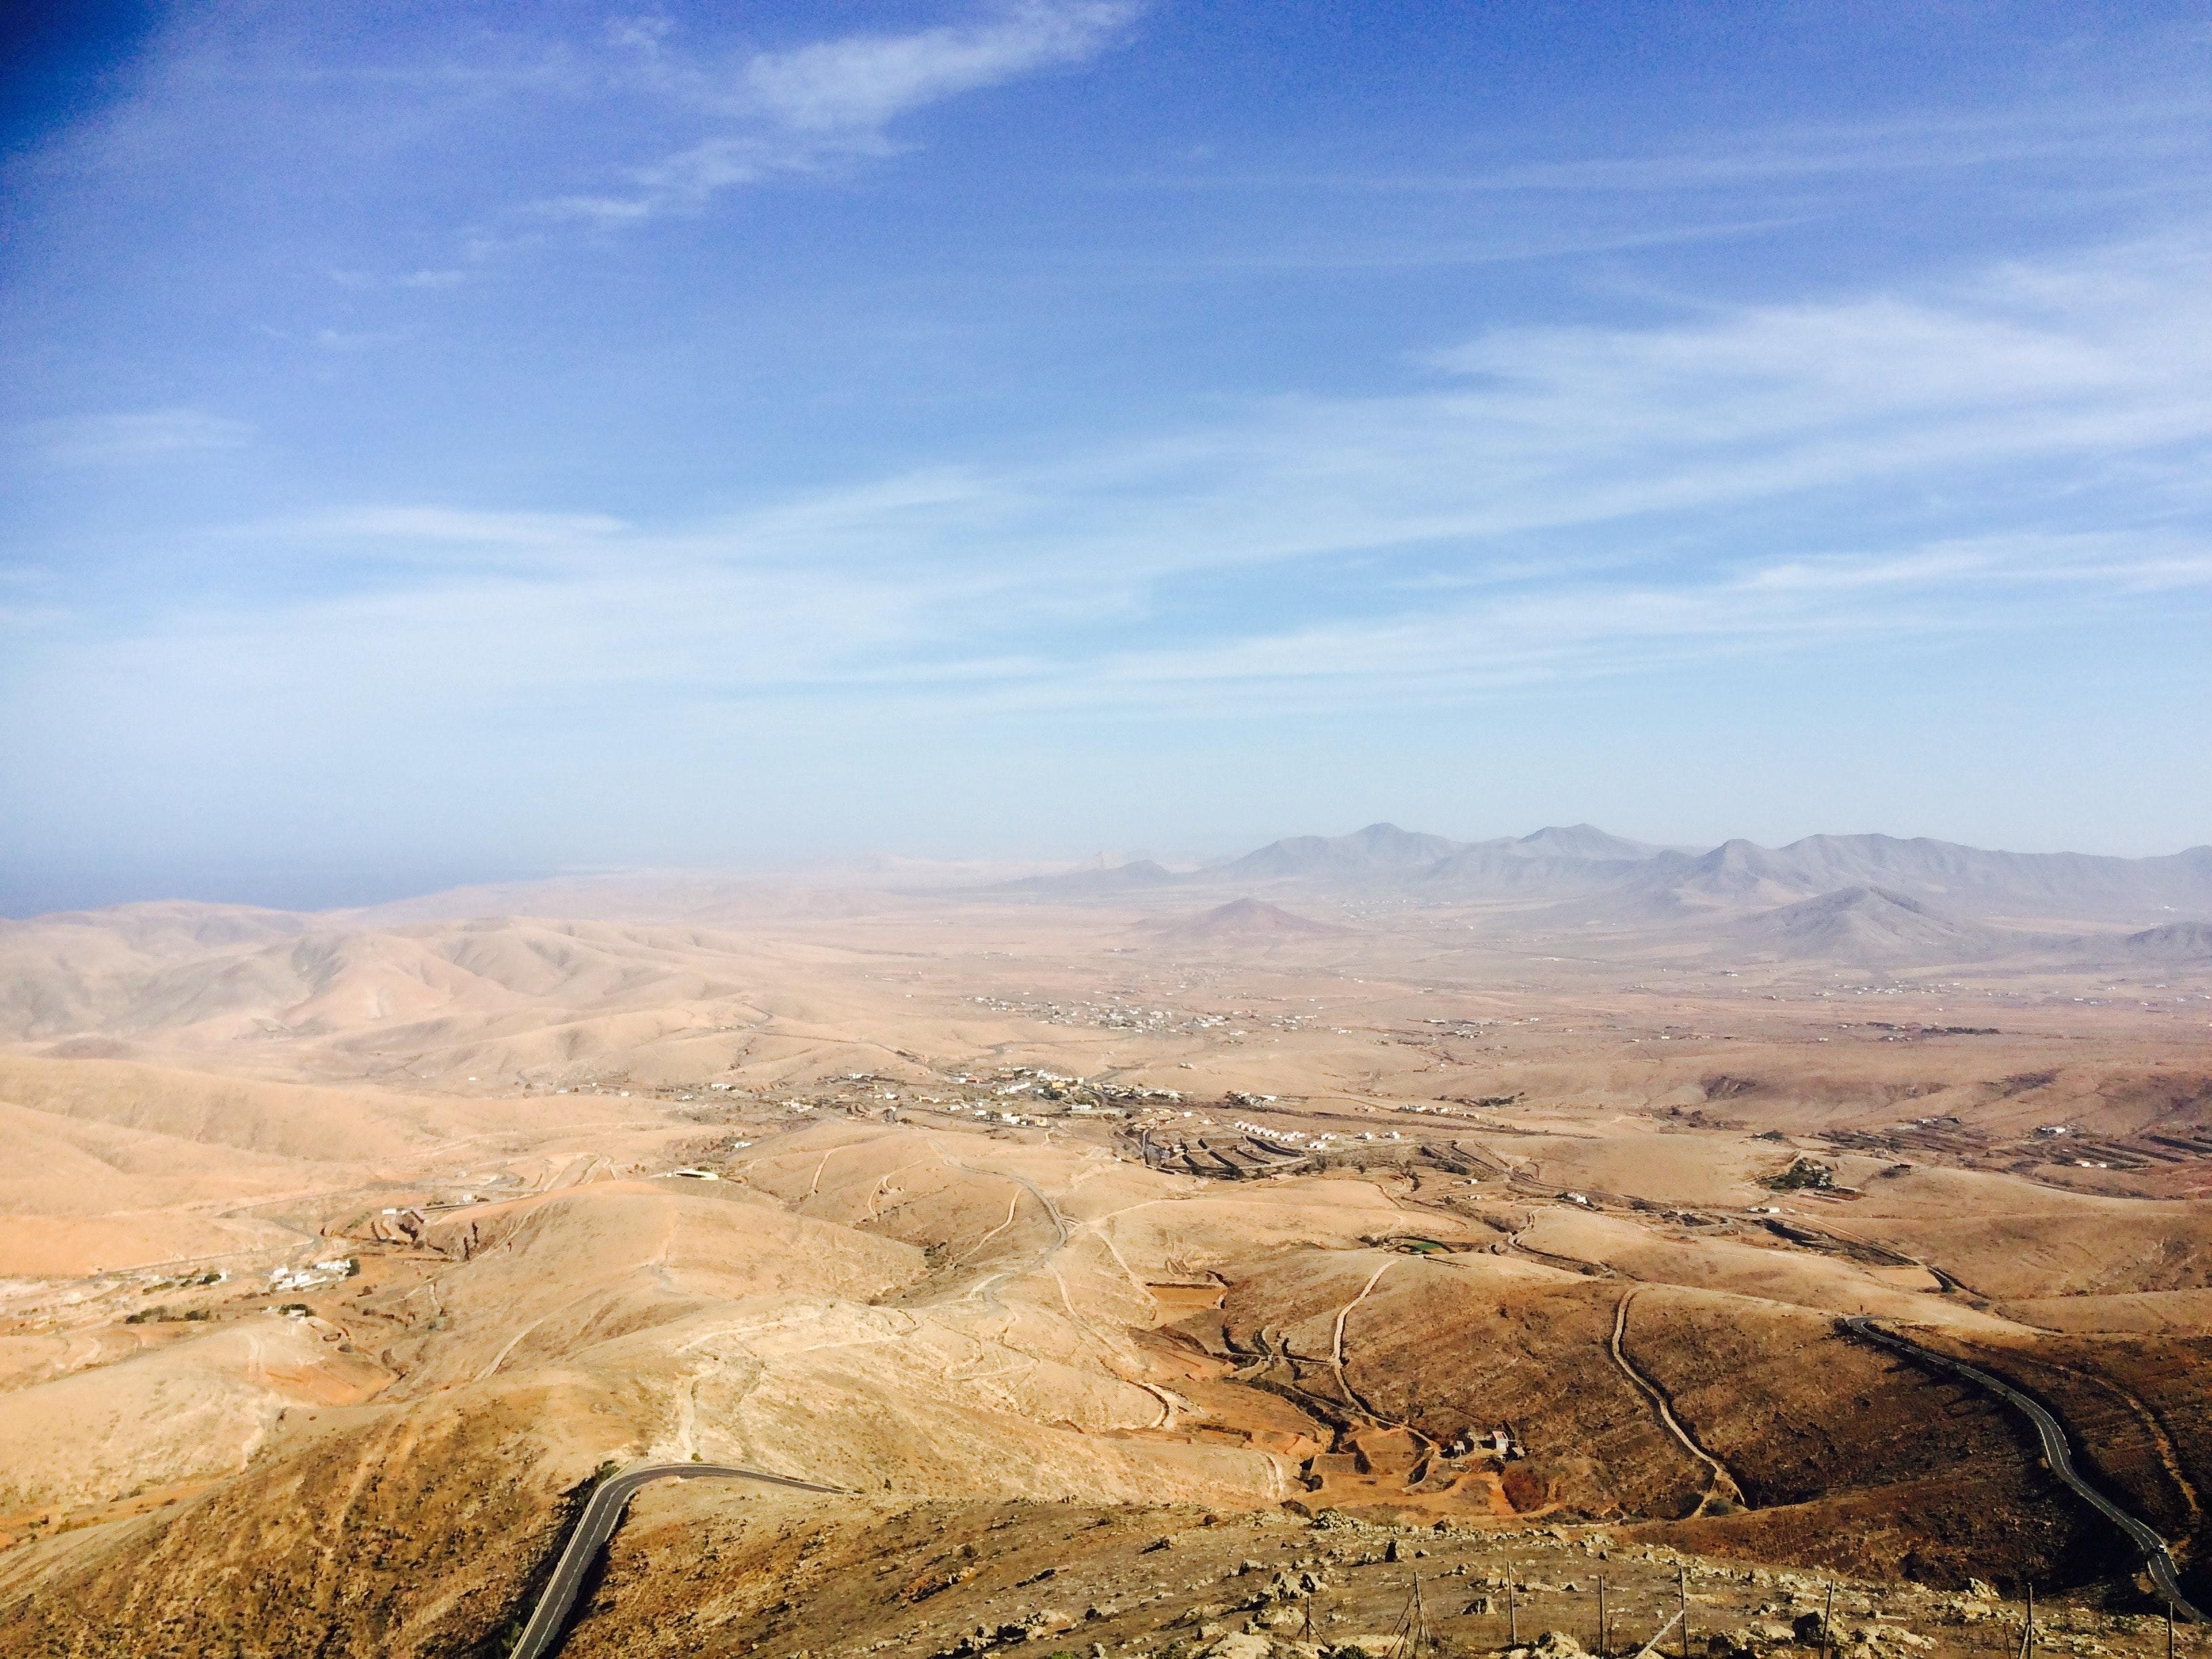 Top view of desert photo